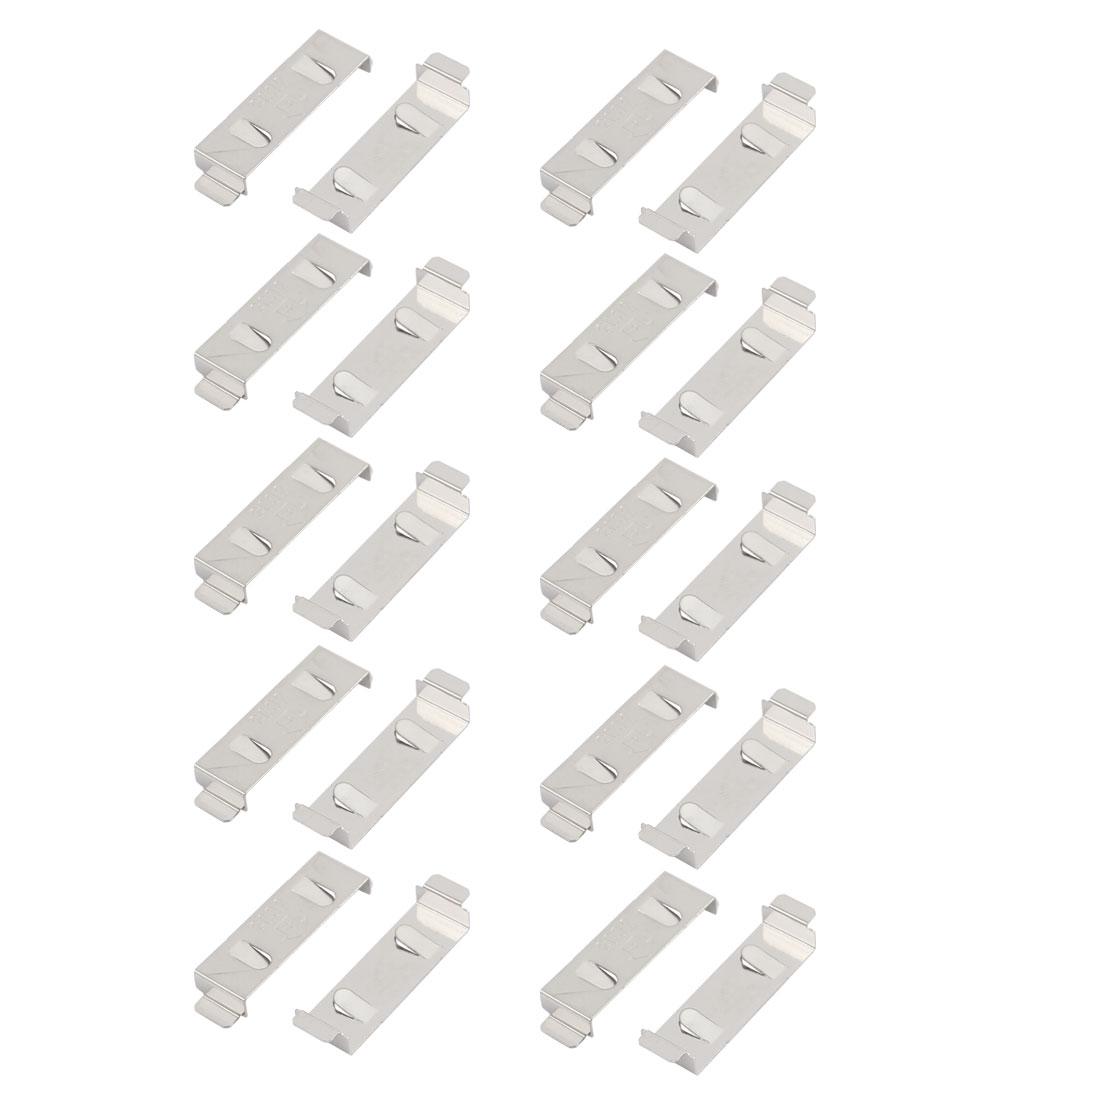 20Pcs Silver Tone Metal CR2032/CR2025 Battery Plate Shrapnel Cilp